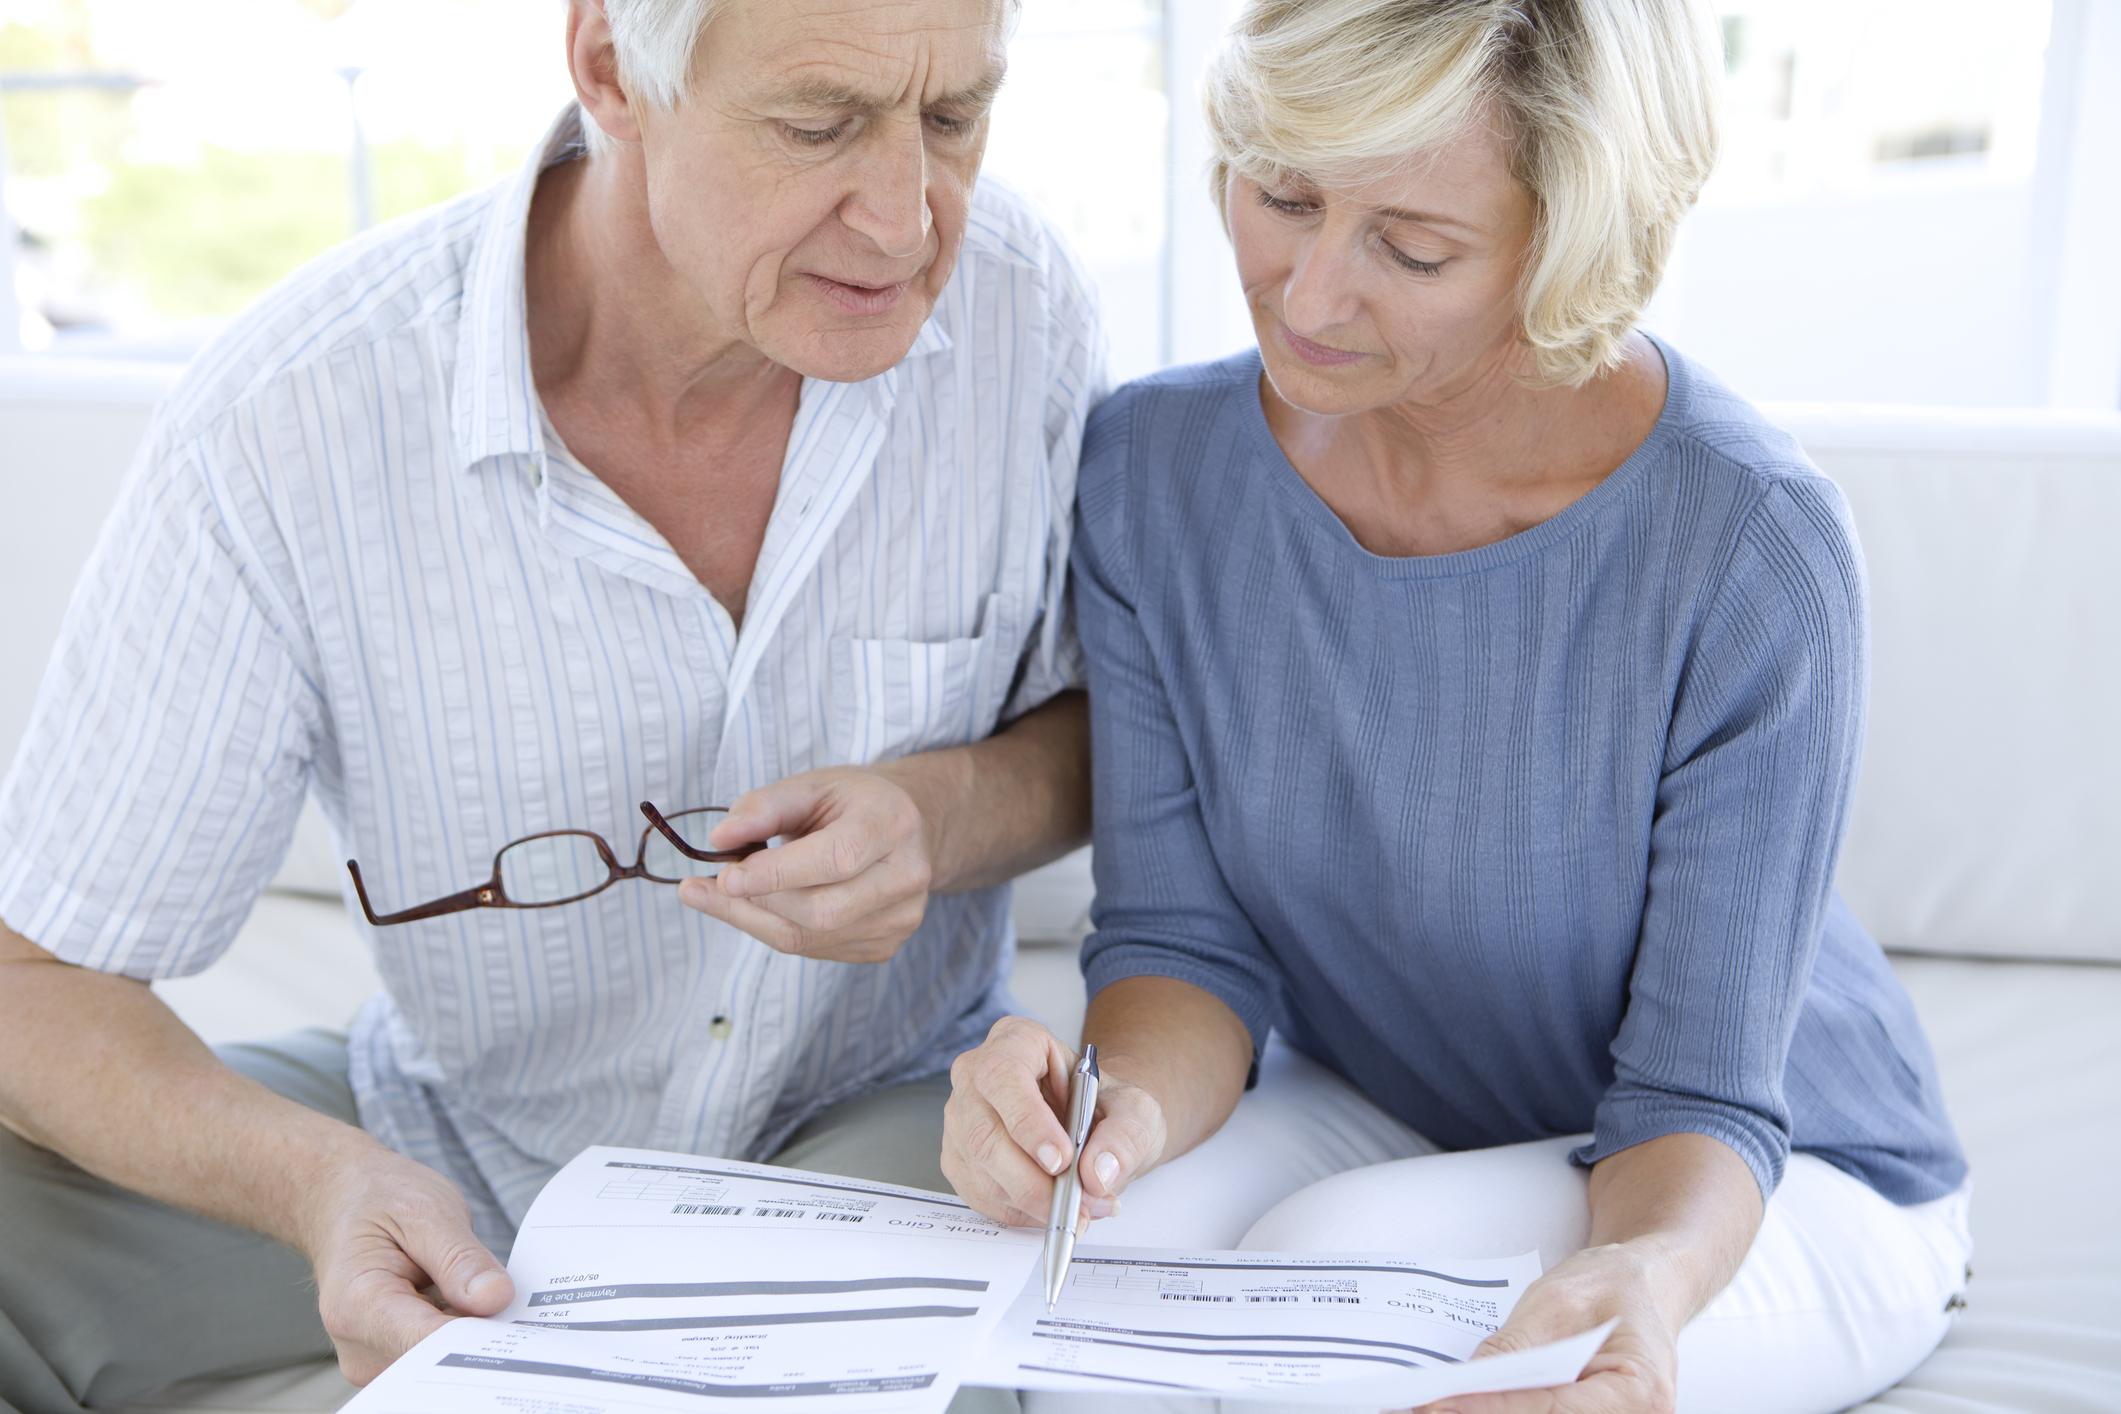 Older couple looking at their bills, worried